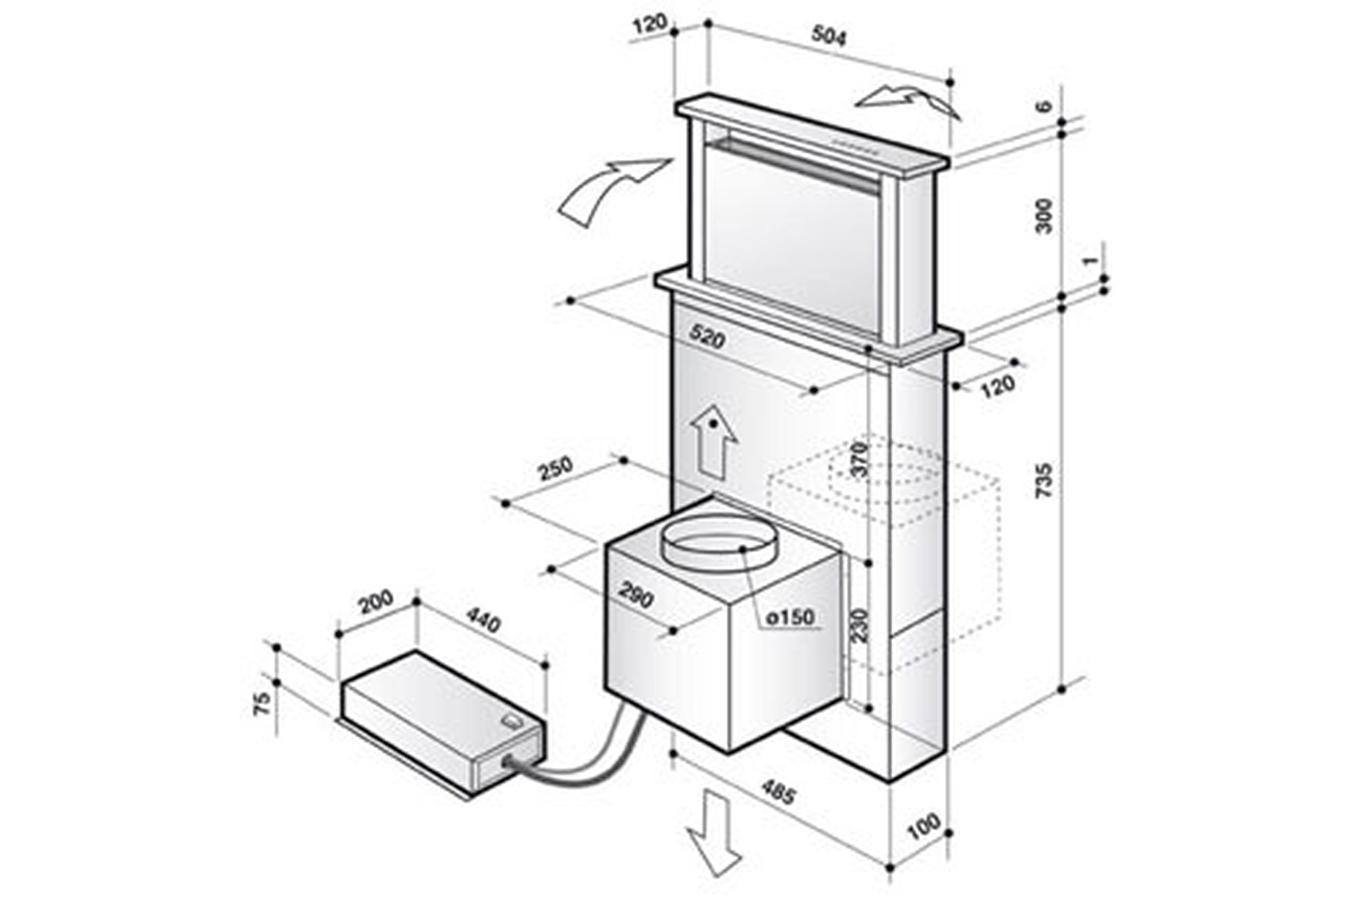 hotte escamotable de dietrich dhd 1101 x 3534979 darty. Black Bedroom Furniture Sets. Home Design Ideas